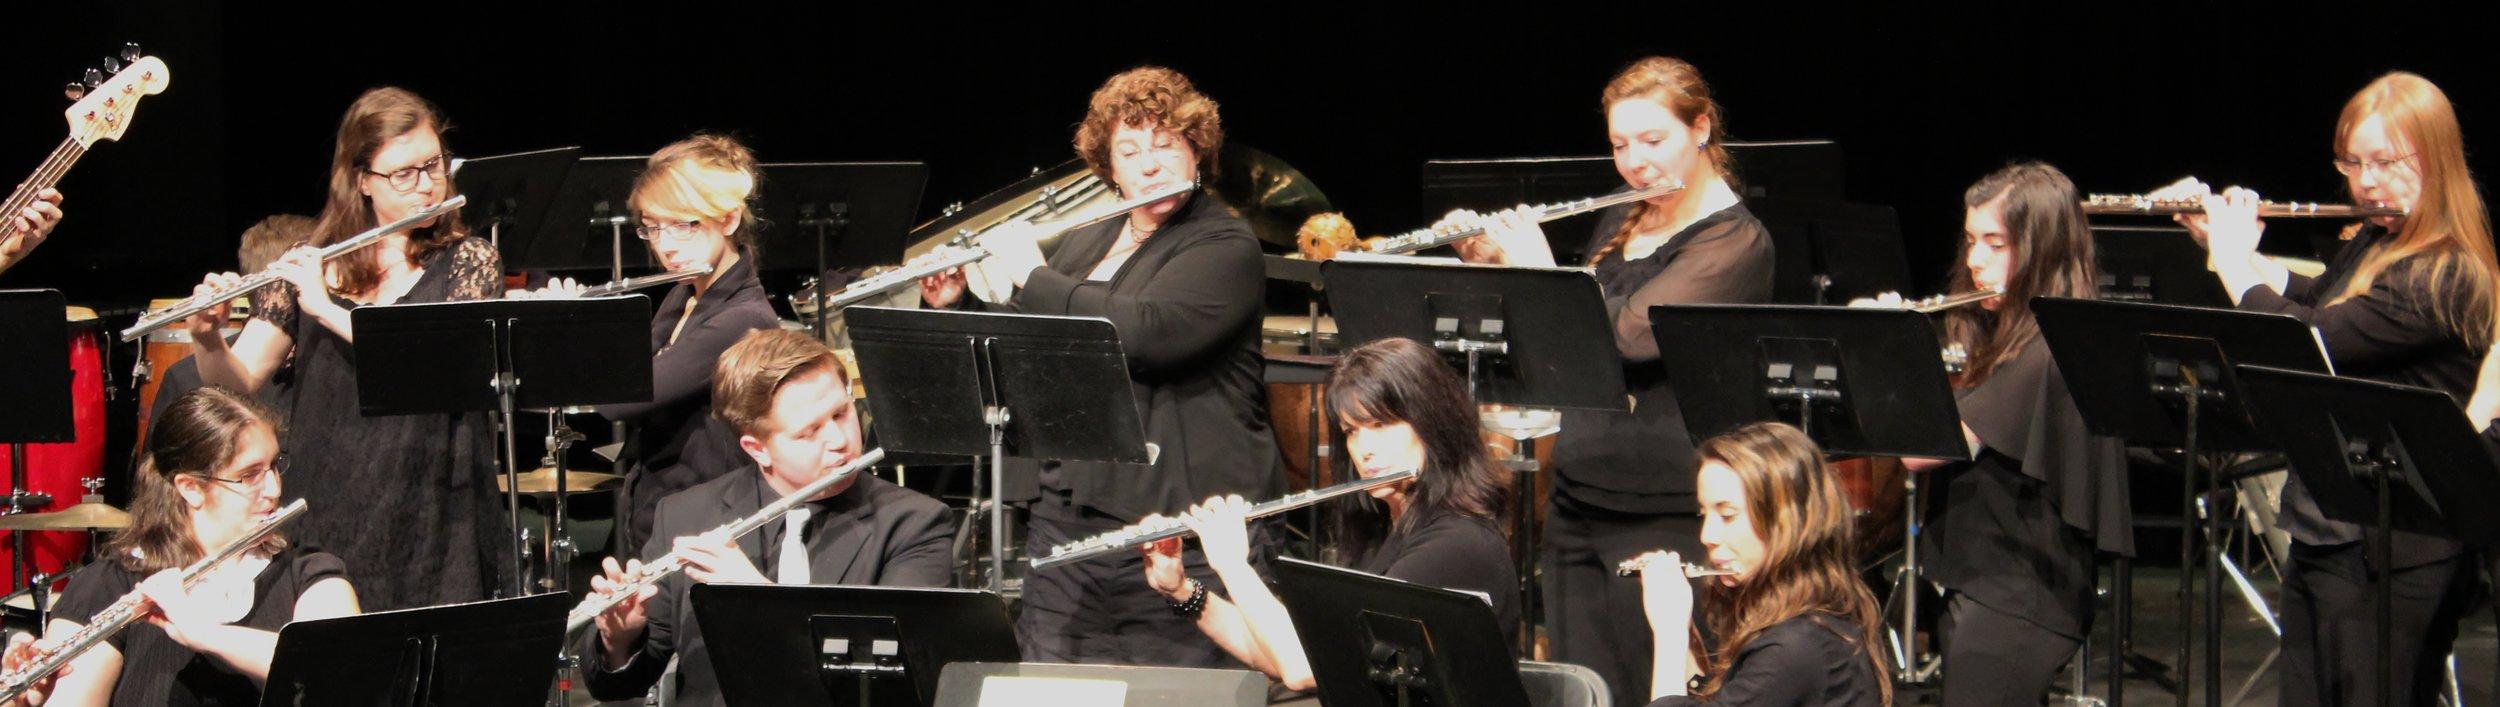 SPU Flute Ensemble 2013